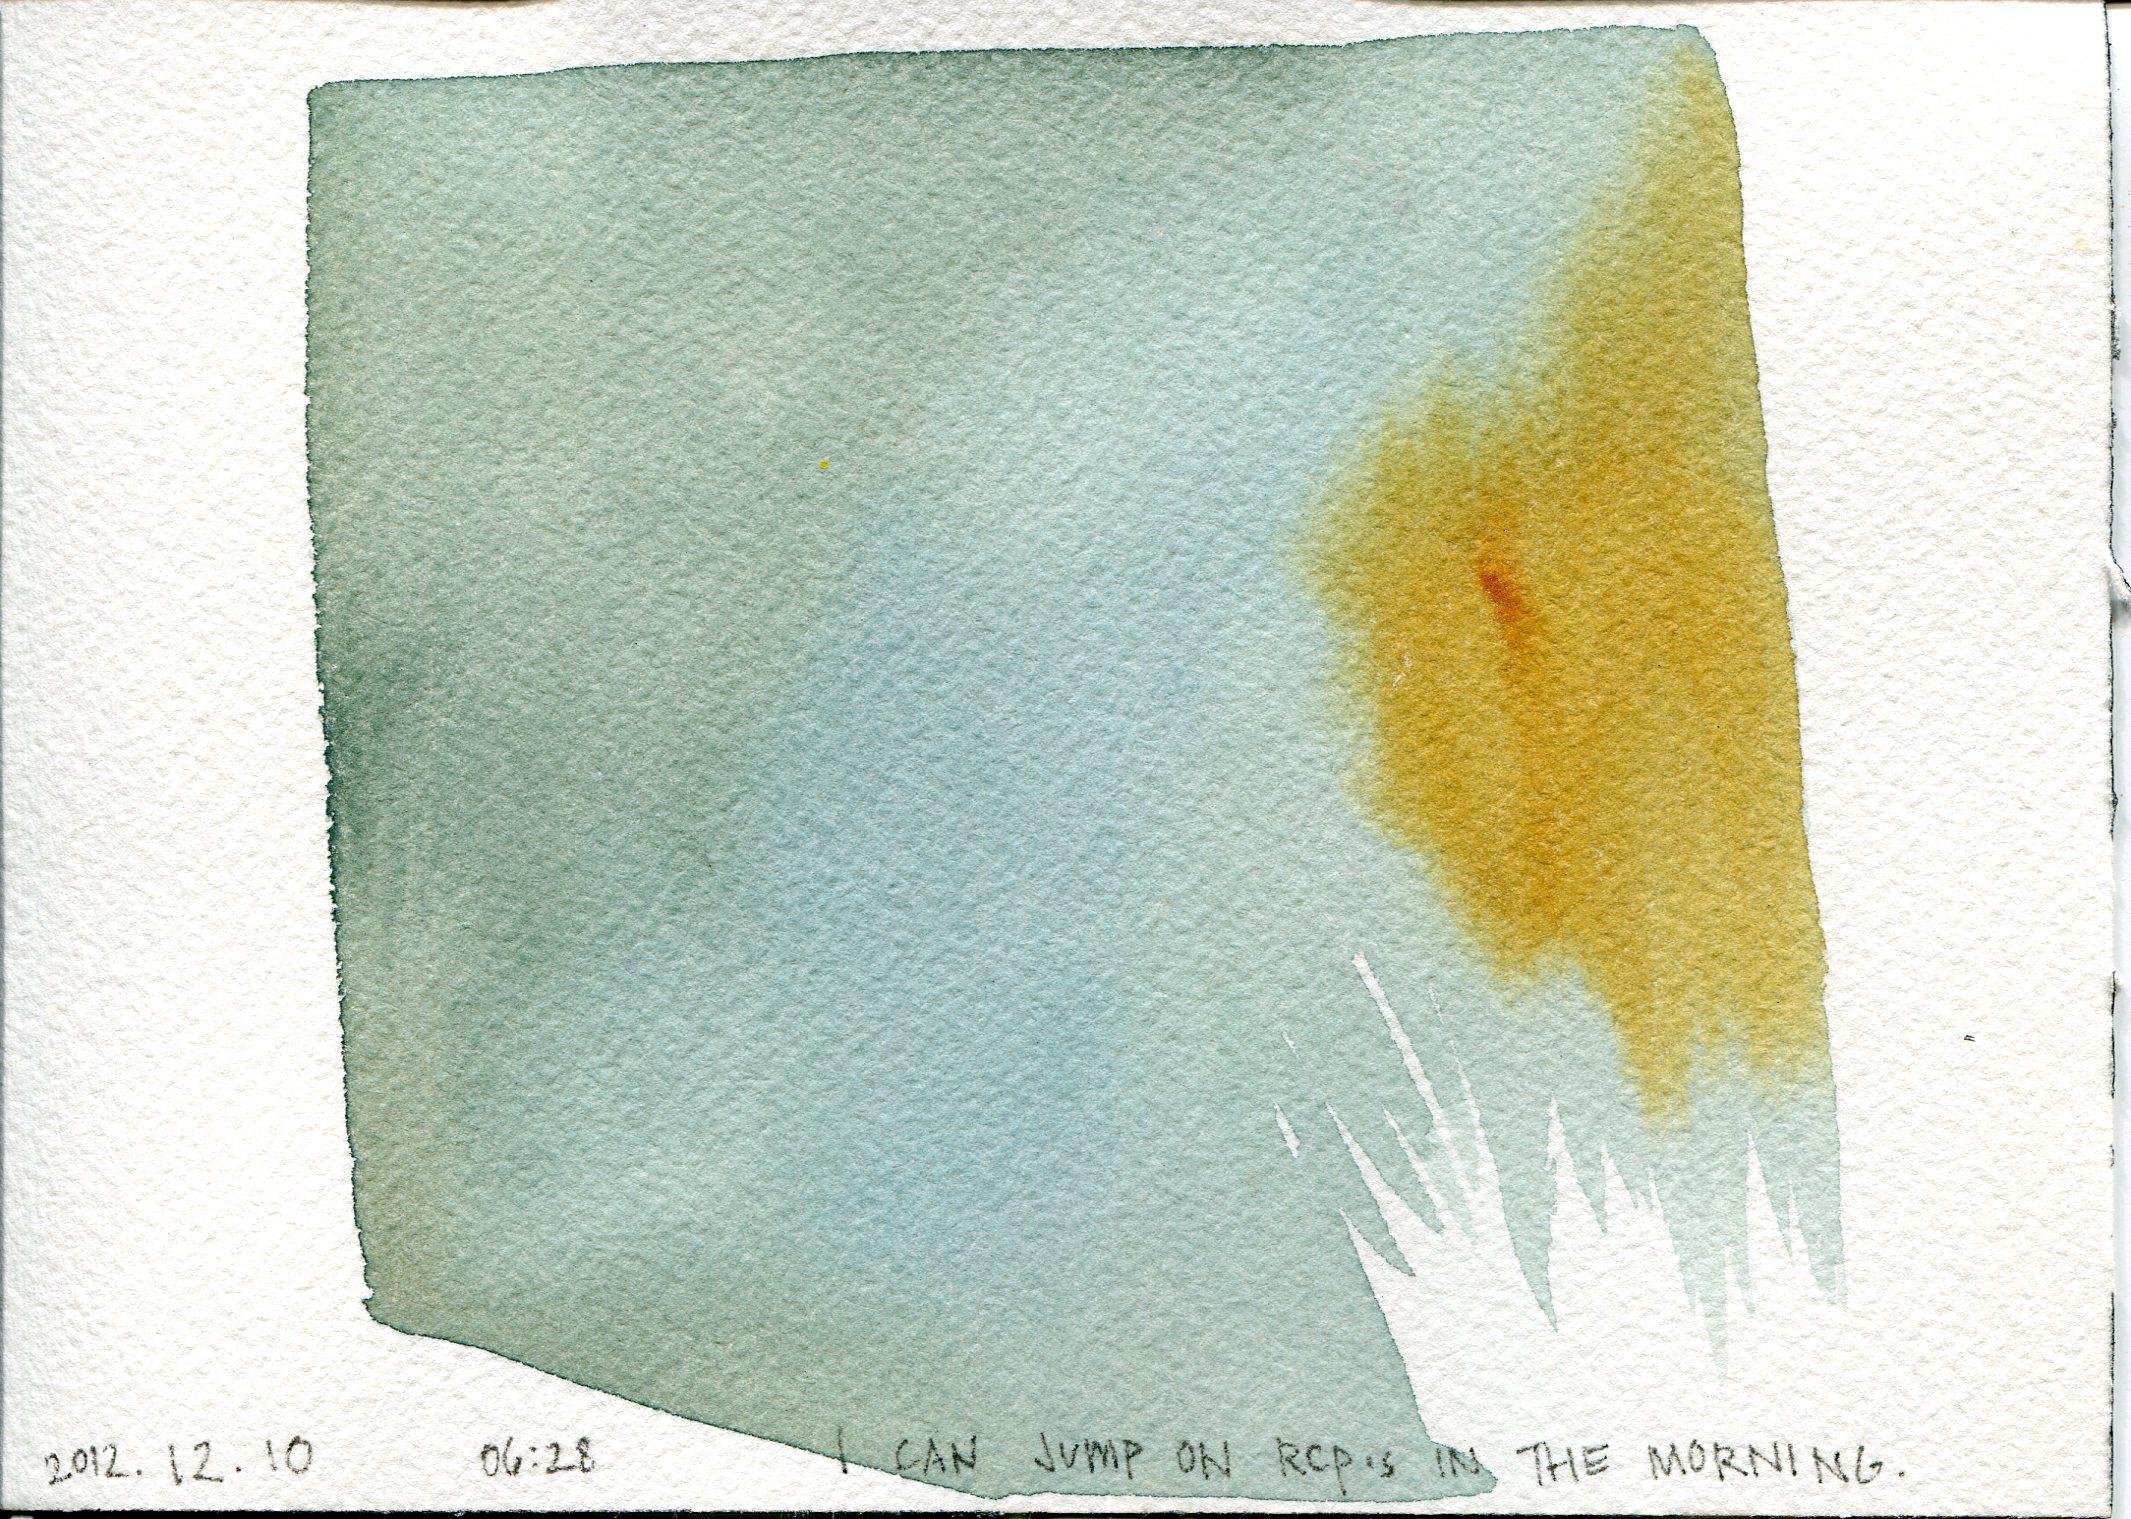 2012-12-16 drawing001.jpg